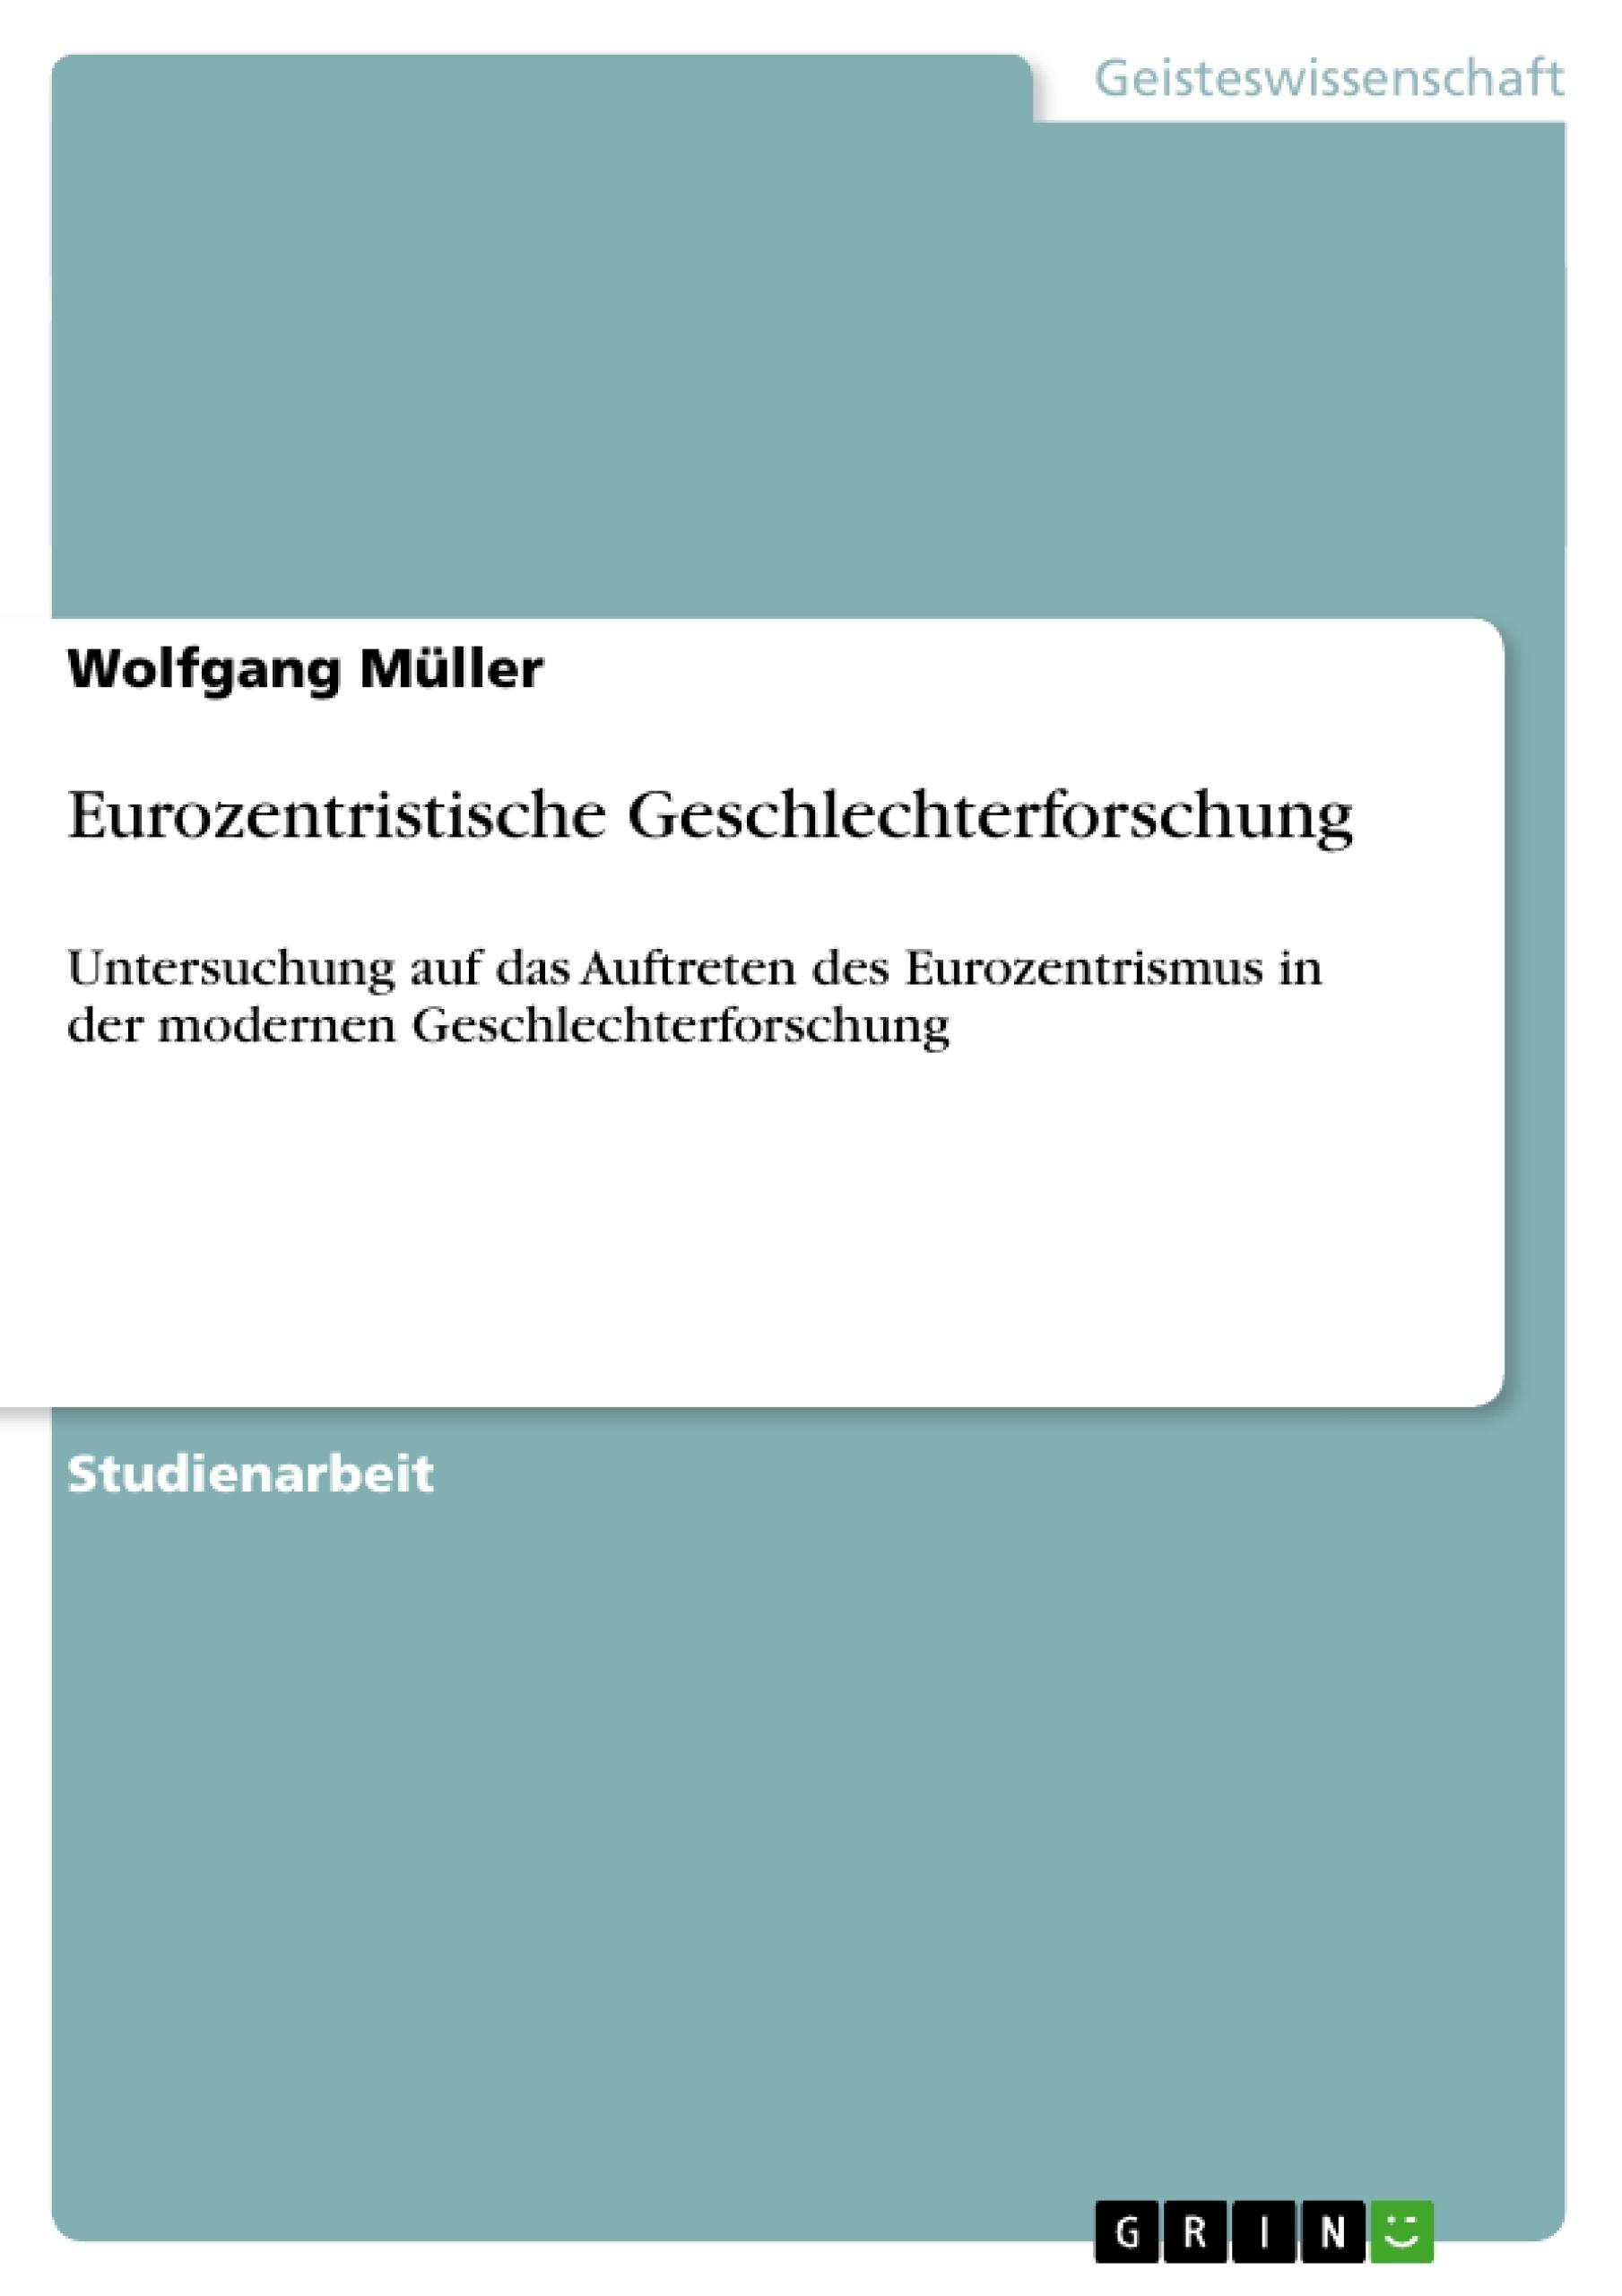 Titel: Eurozentristische Geschlechterforschung